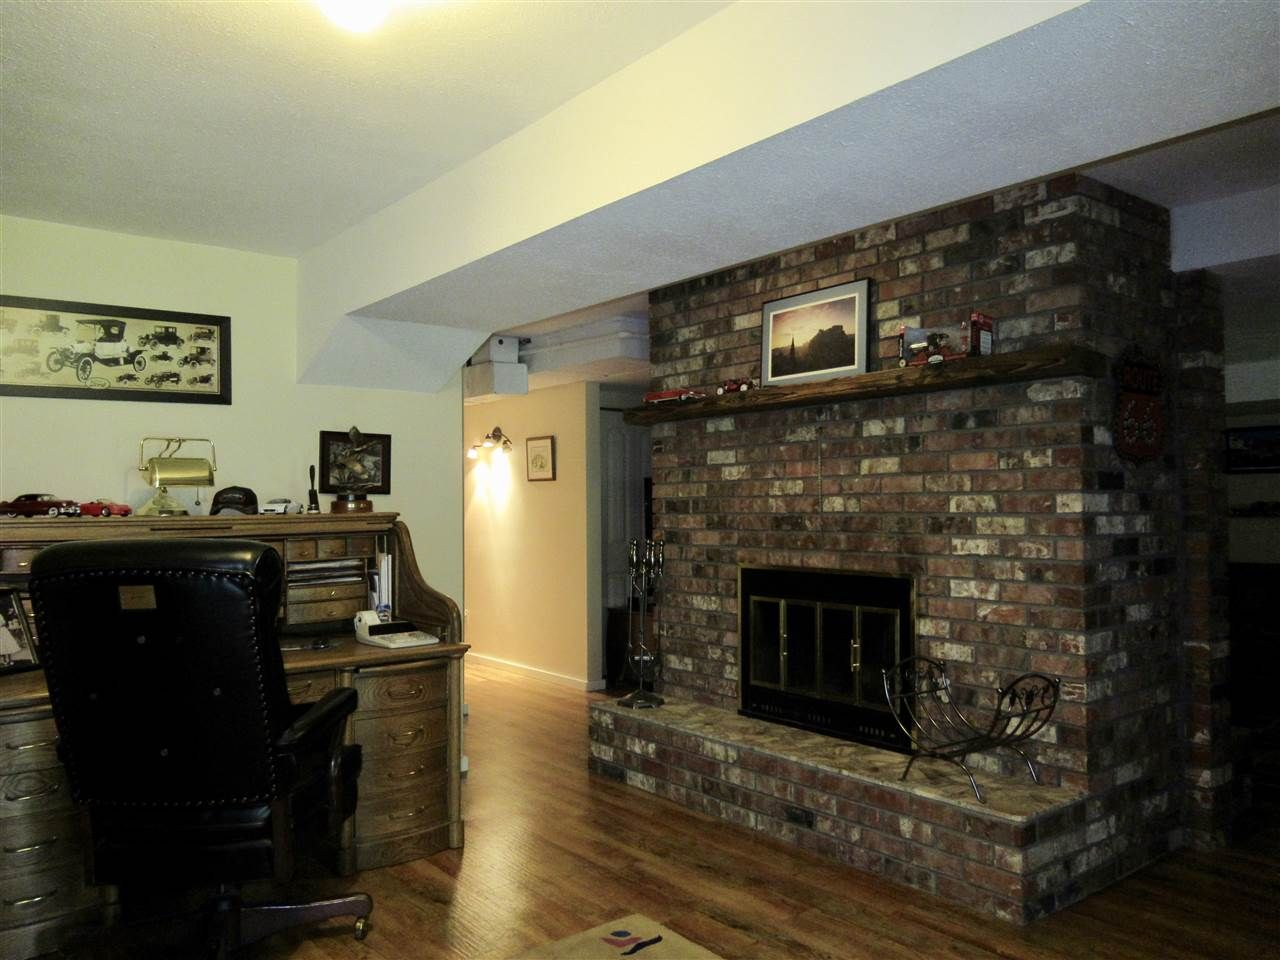 Photo 10: Photos: 911 CENTAUR Drive in Williams Lake: Esler/Dog Creek House for sale (Williams Lake (Zone 27))  : MLS®# R2378444